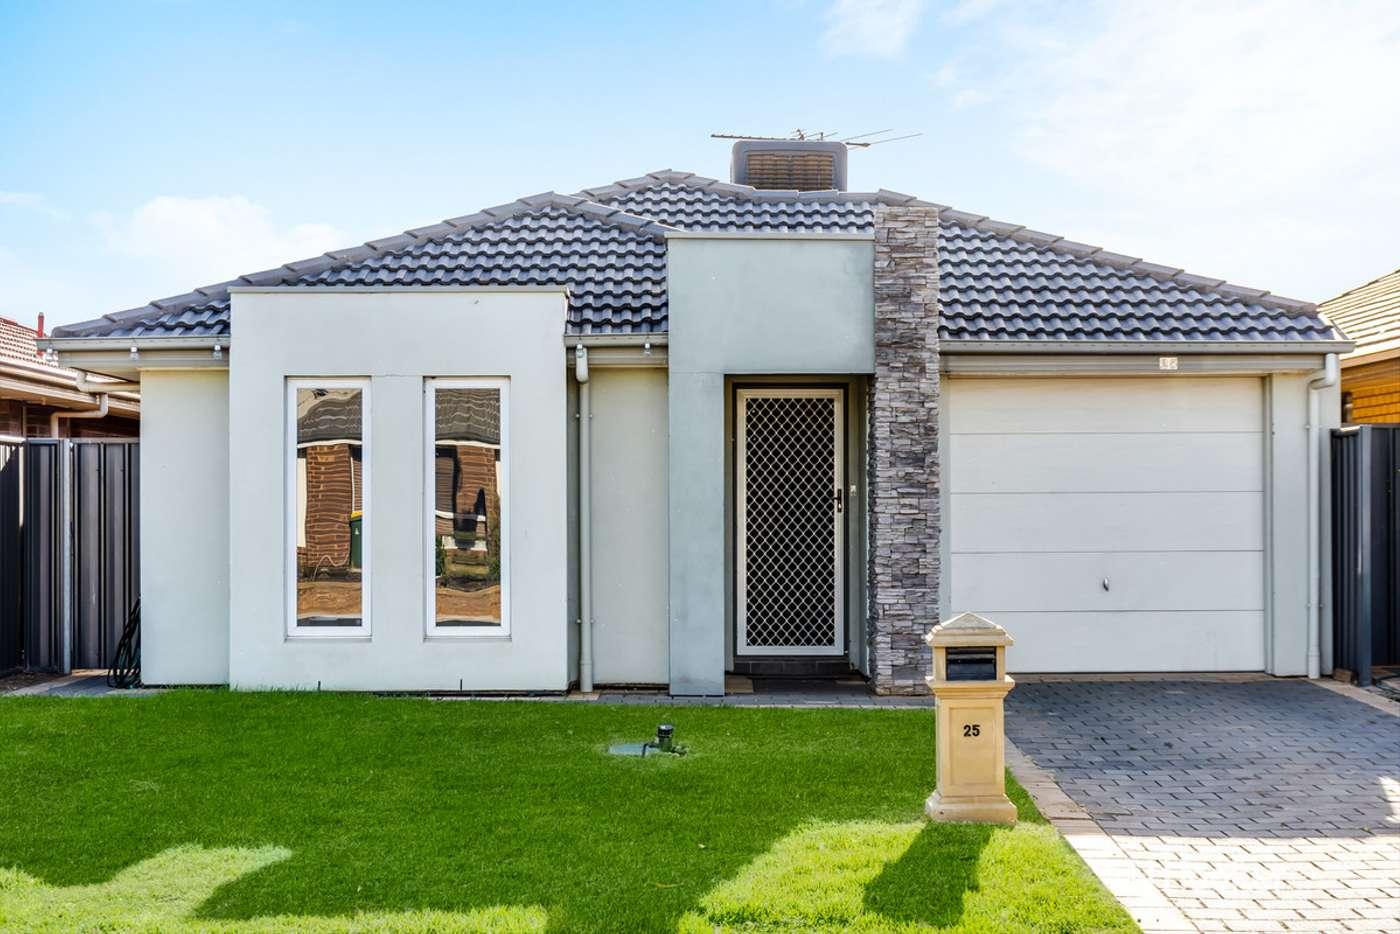 Main view of Homely house listing, 25 Valiant Road, Munno Para West SA 5115